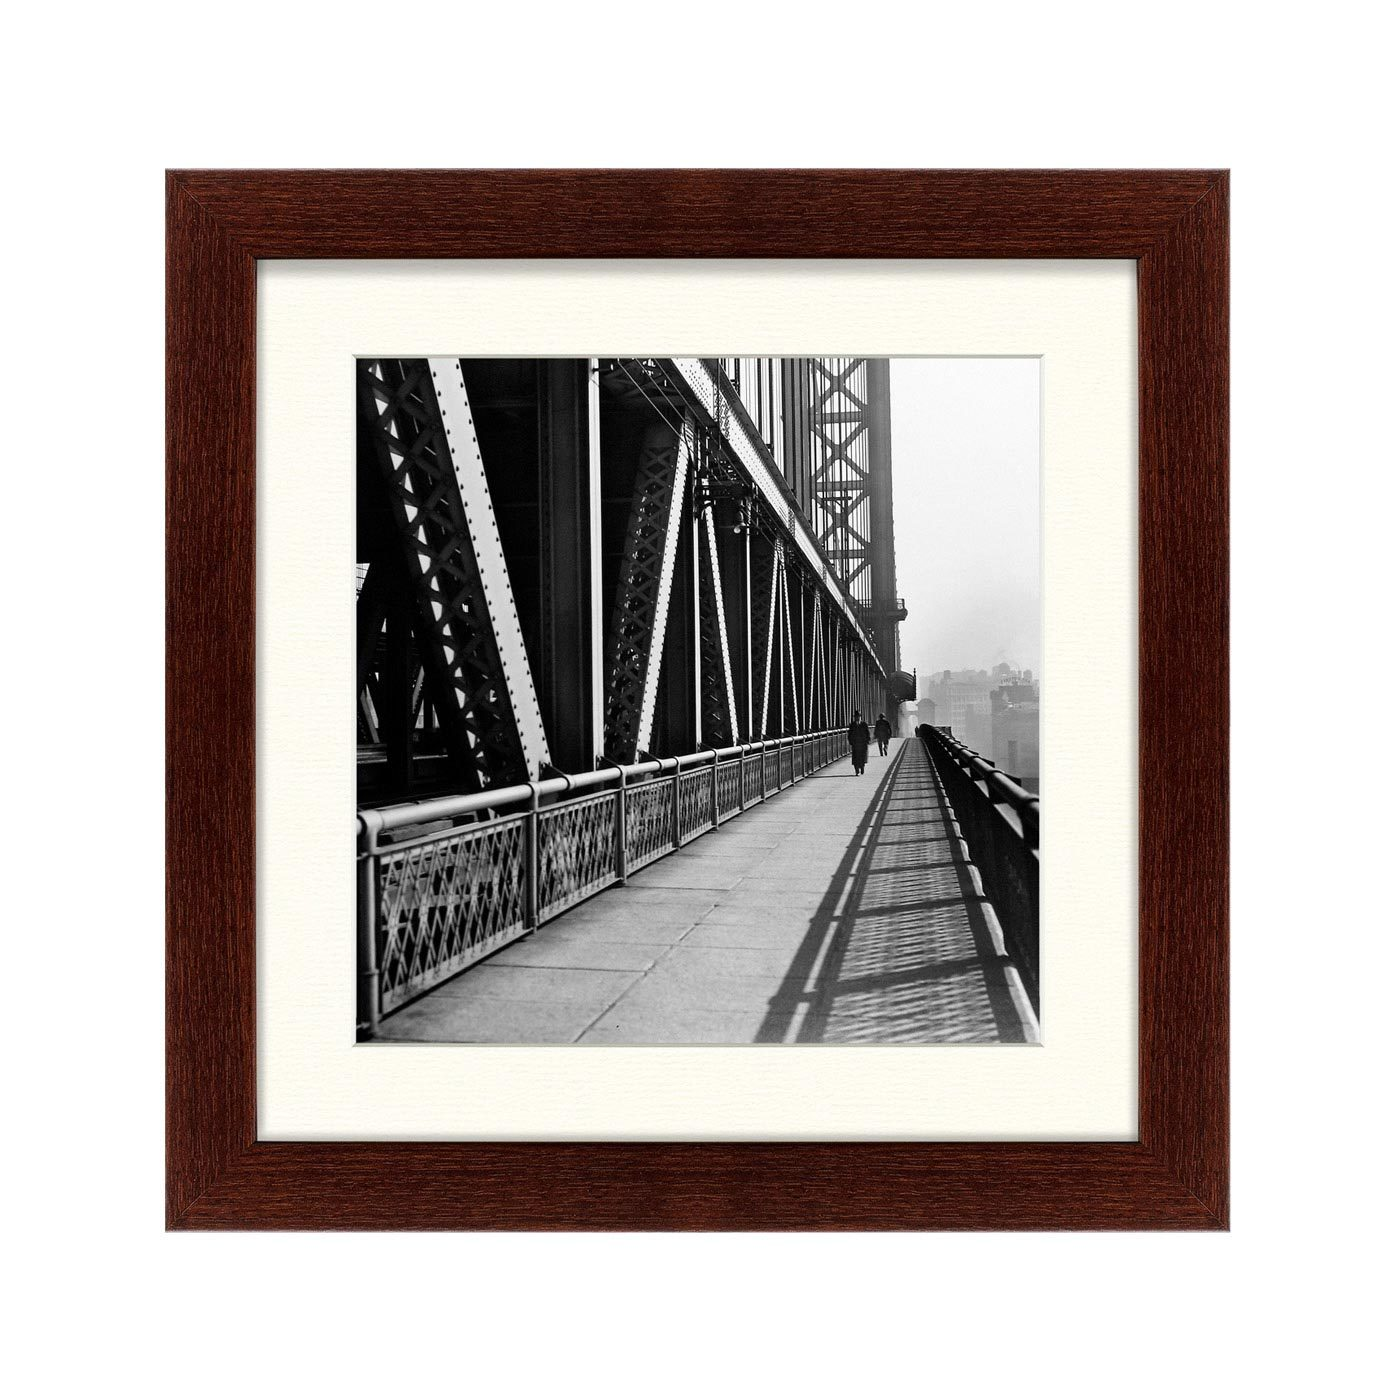 {} Картины в Квартиру Картина Манхэттенский Мост (35х35 см) картины в квартиру картина слон 79х100 см